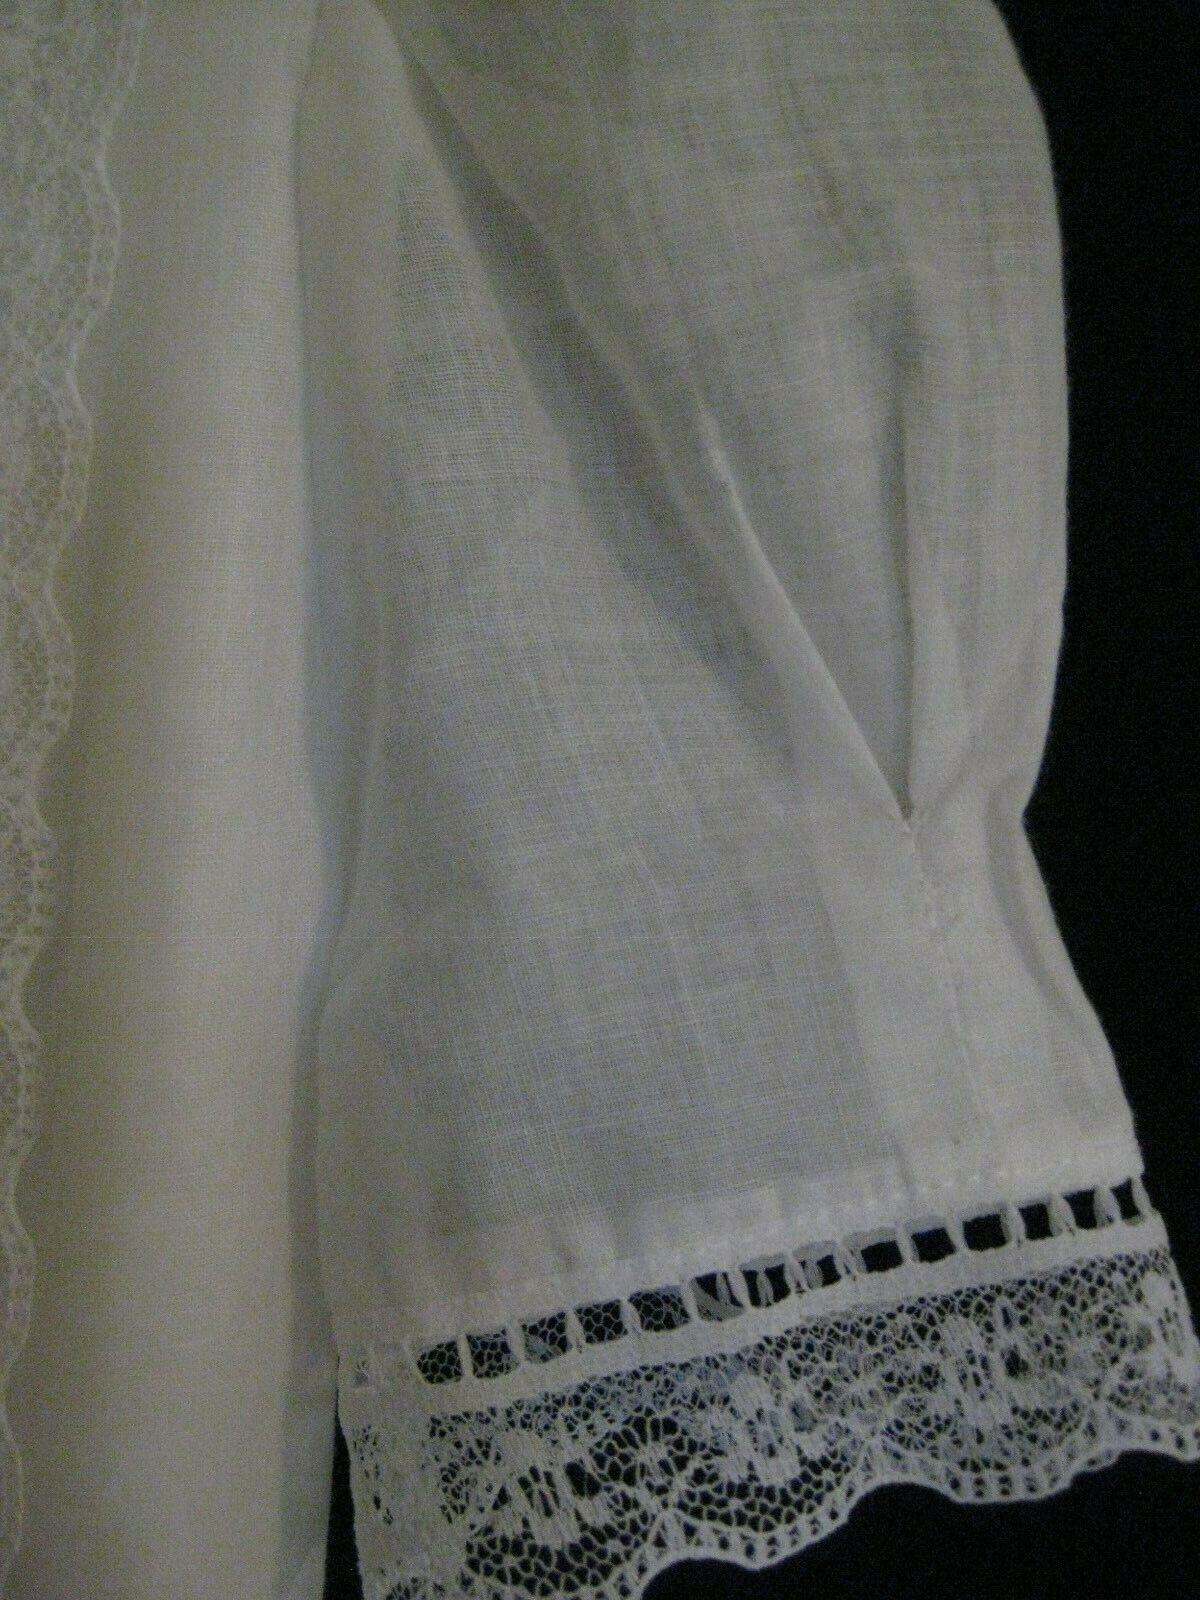 Gunne Sax White Dress Girls Size 12 Pre-Owned - image 5